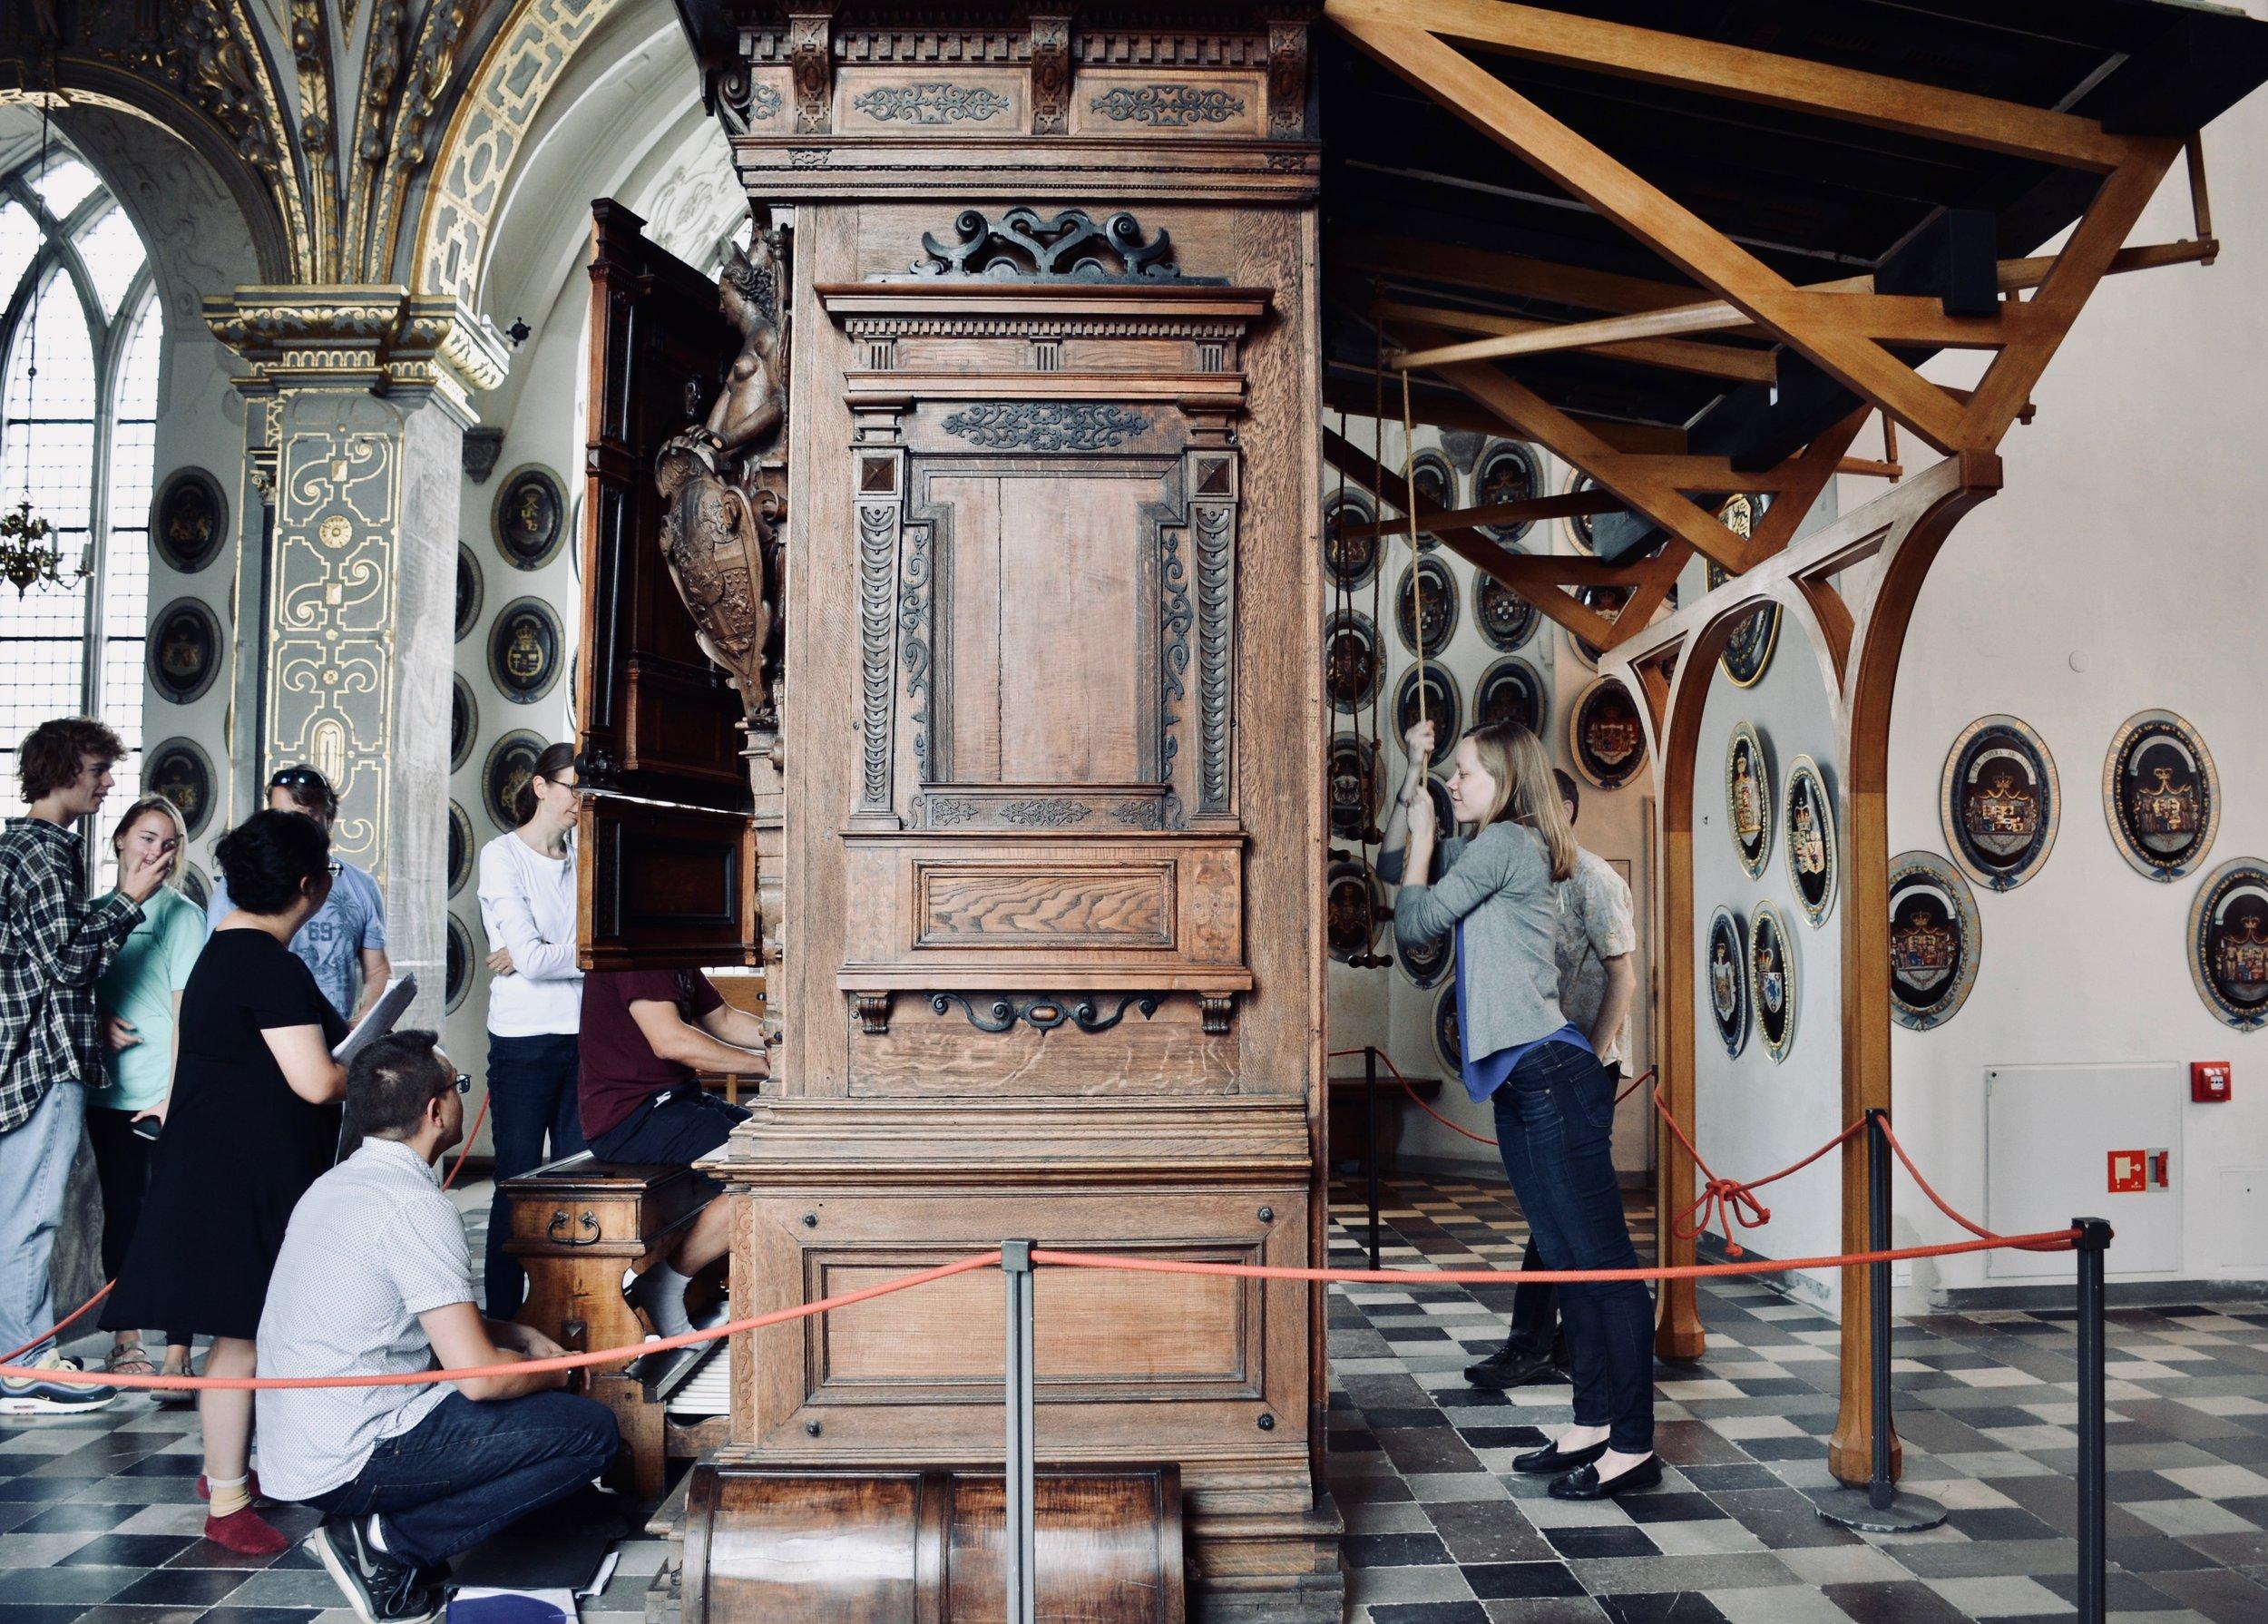 Laura Gullett pumps the bellows. 1610 Compenius organ, Frederiksborg Castle, Hillerød, Denmark.